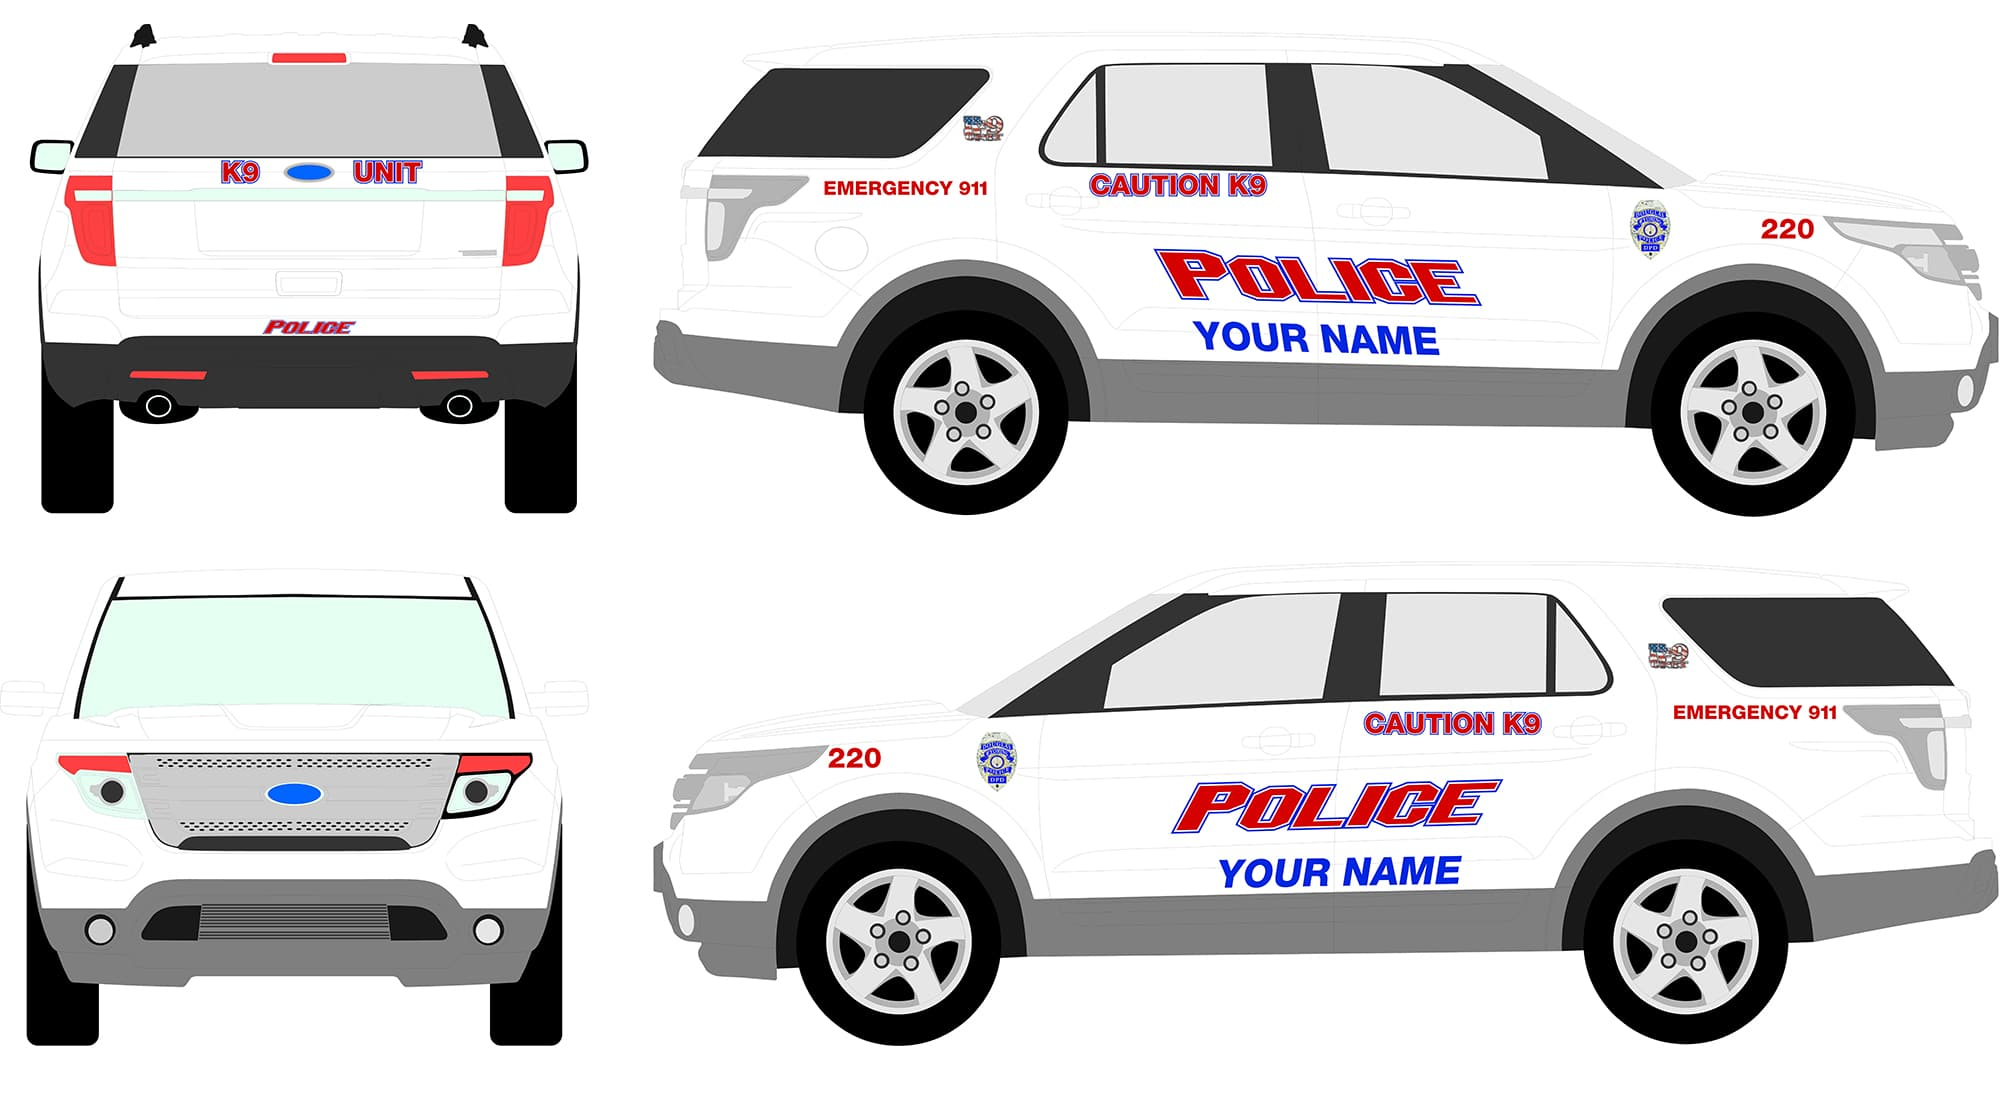 Police Car Graphics Kits Svi Vinyl Police Graphics For